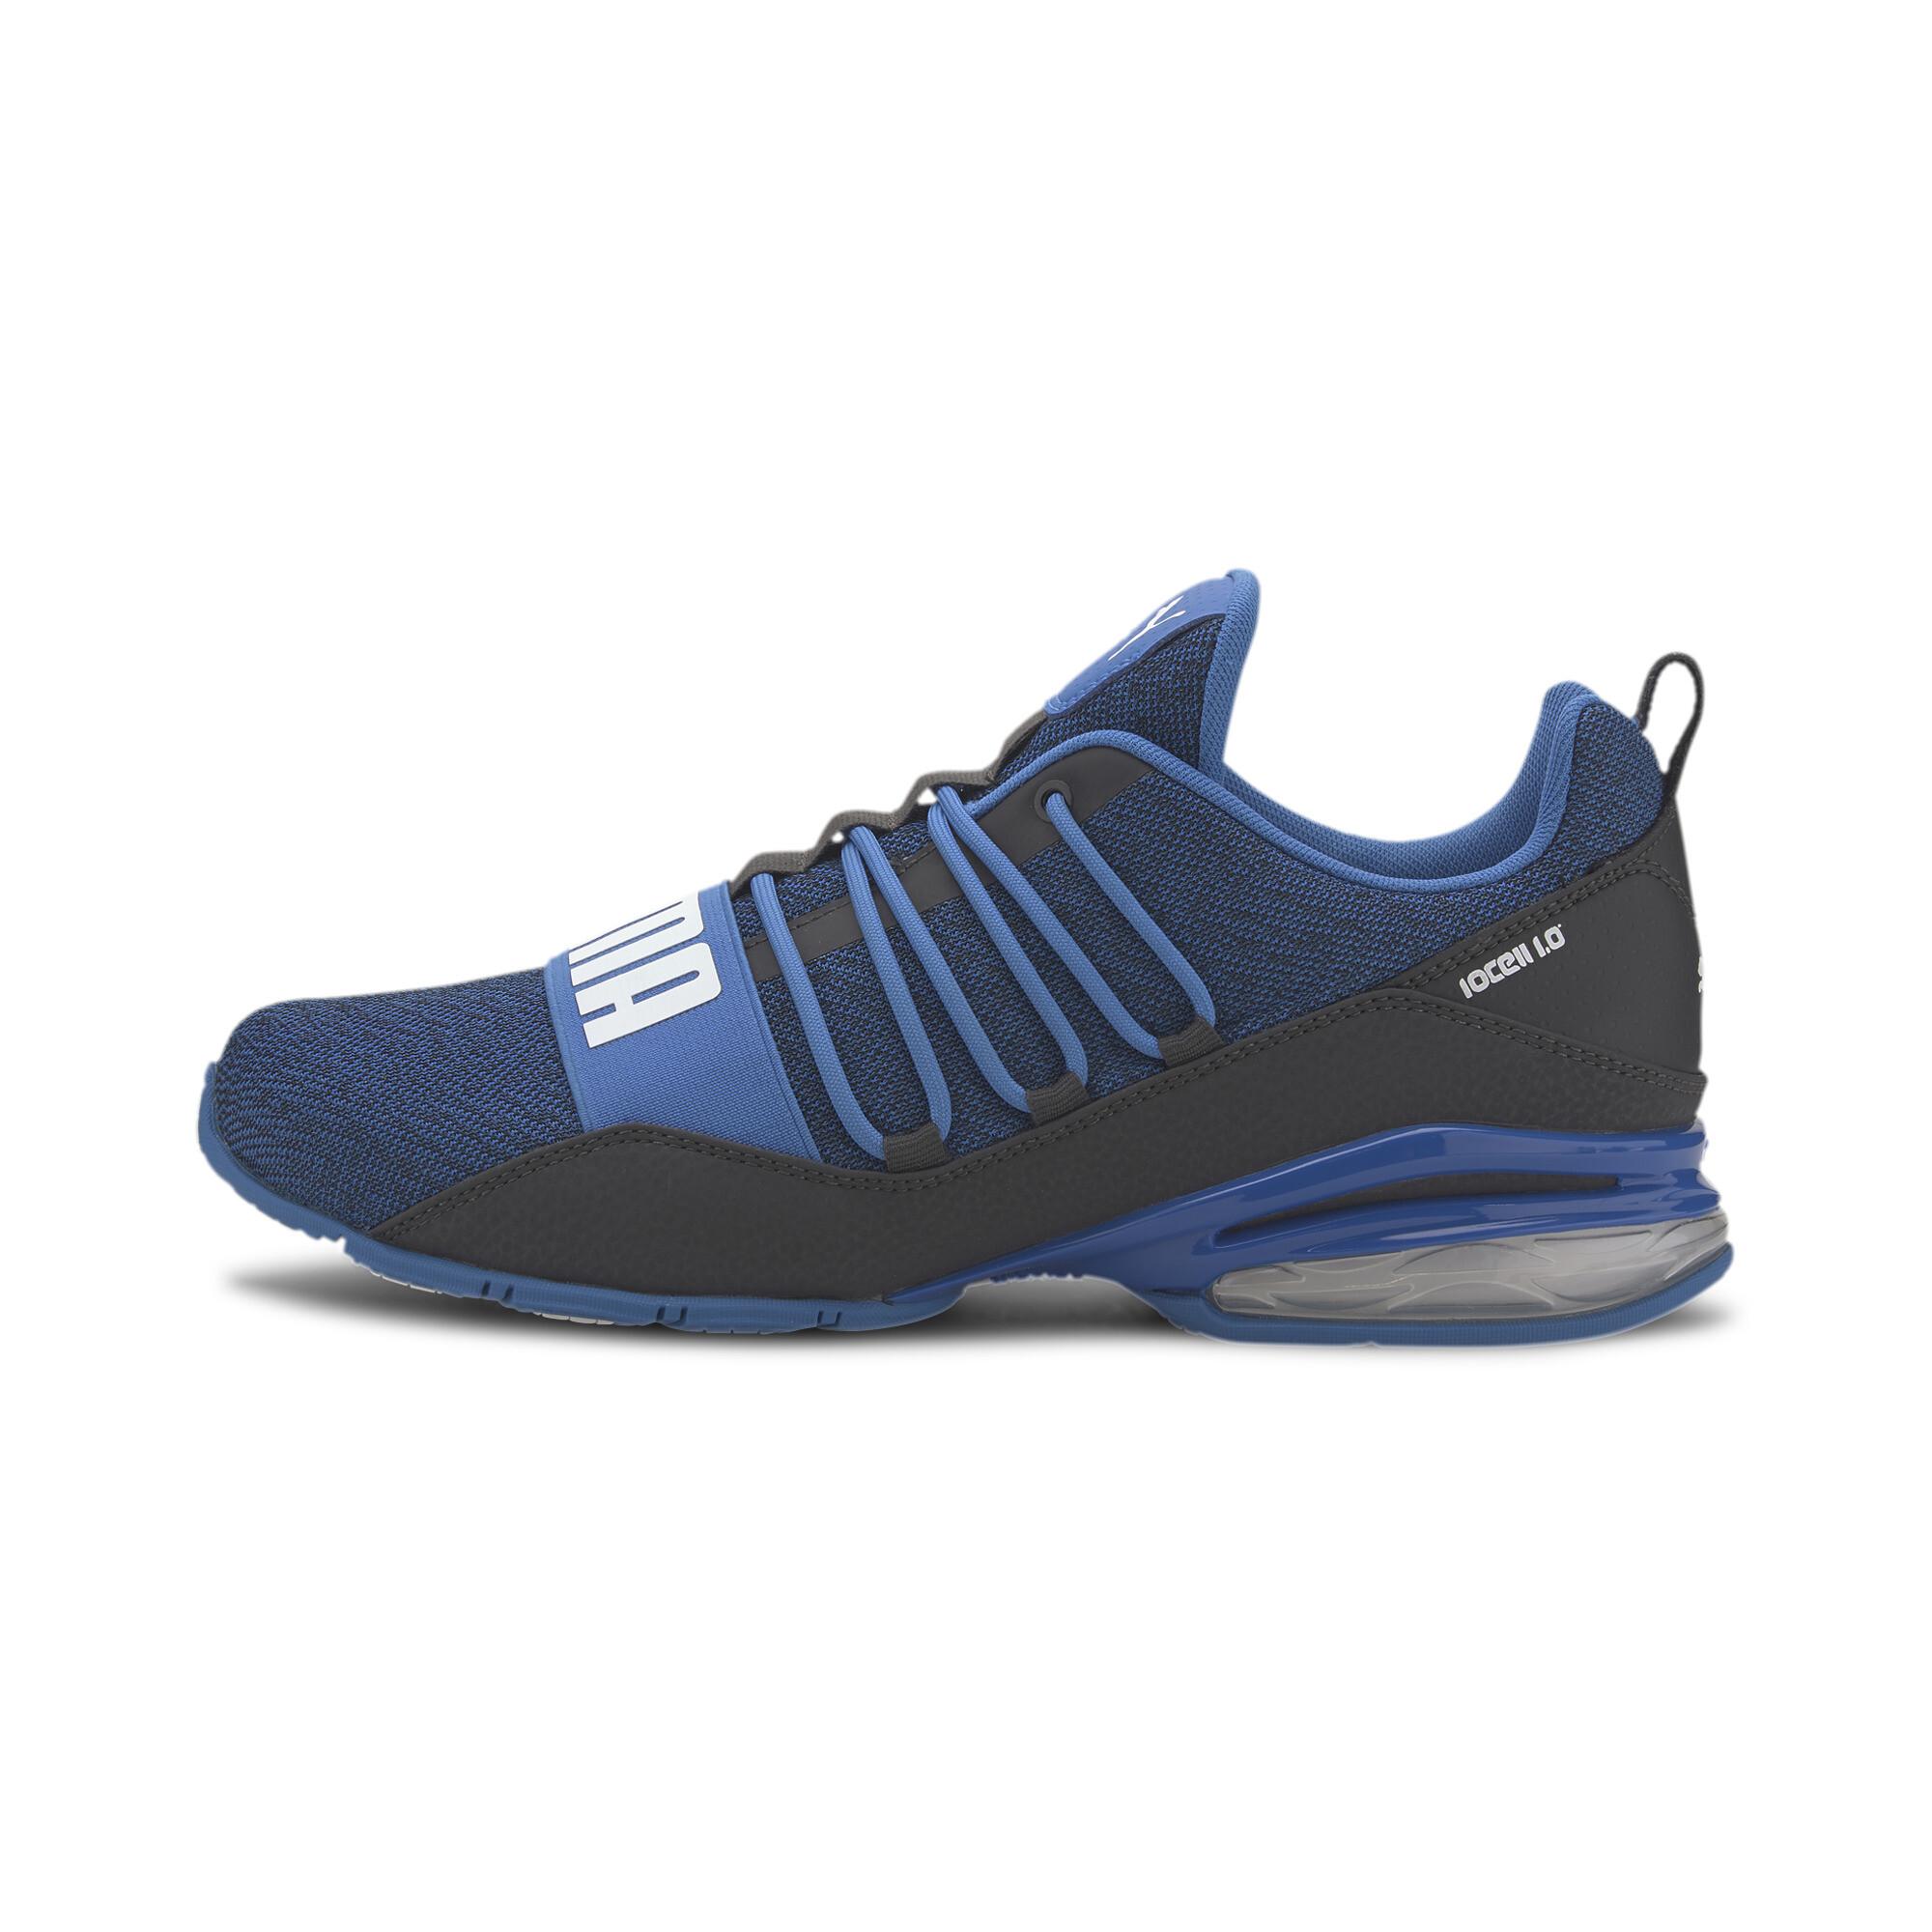 PUMA-Men-039-s-CELL-Regulate-Bold-Training-Shoes thumbnail 11